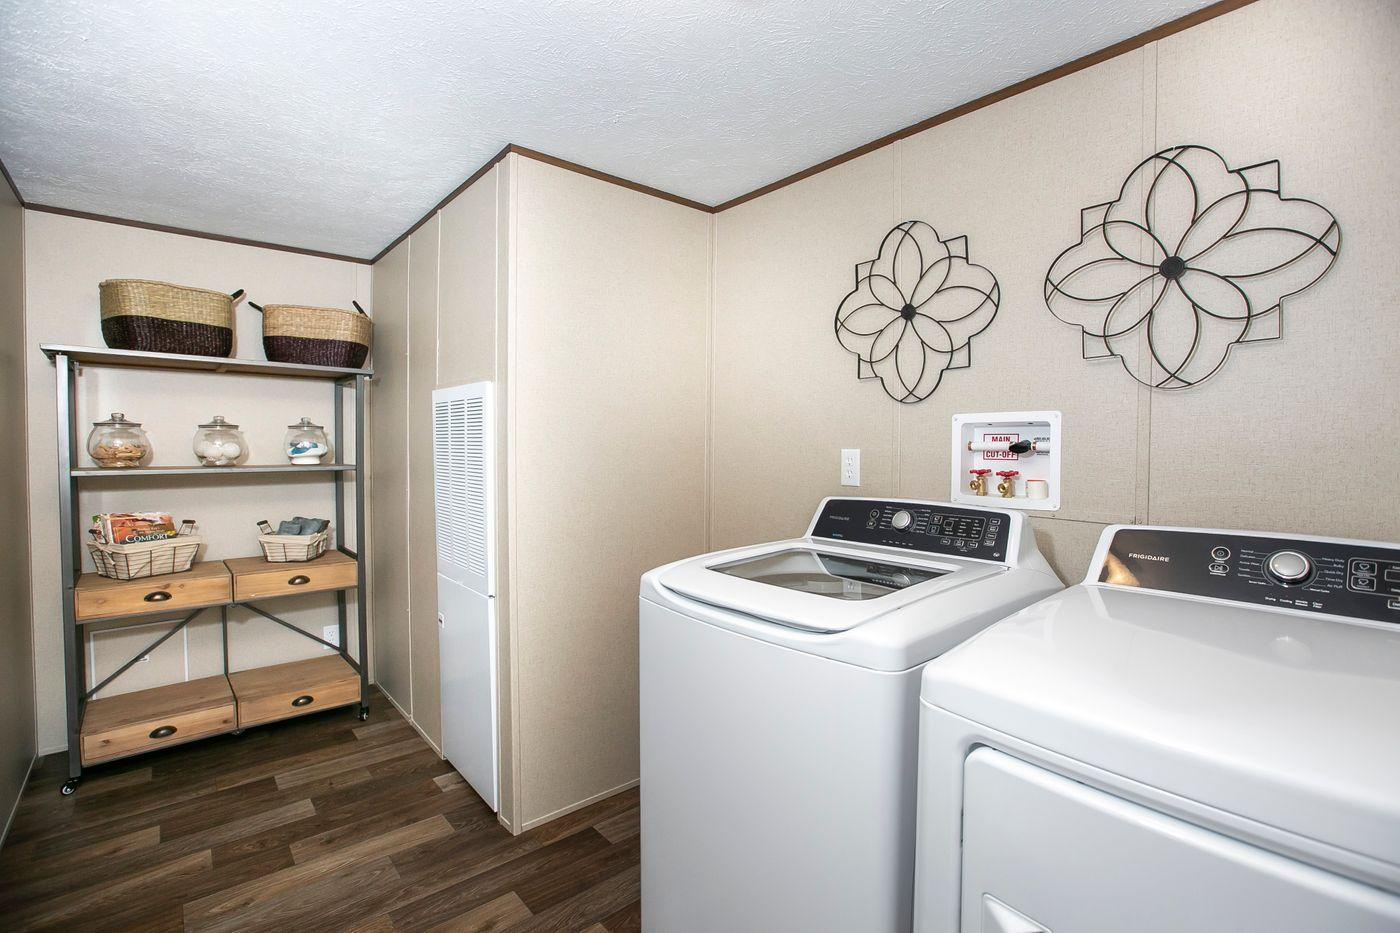 Triumph Laundry Room